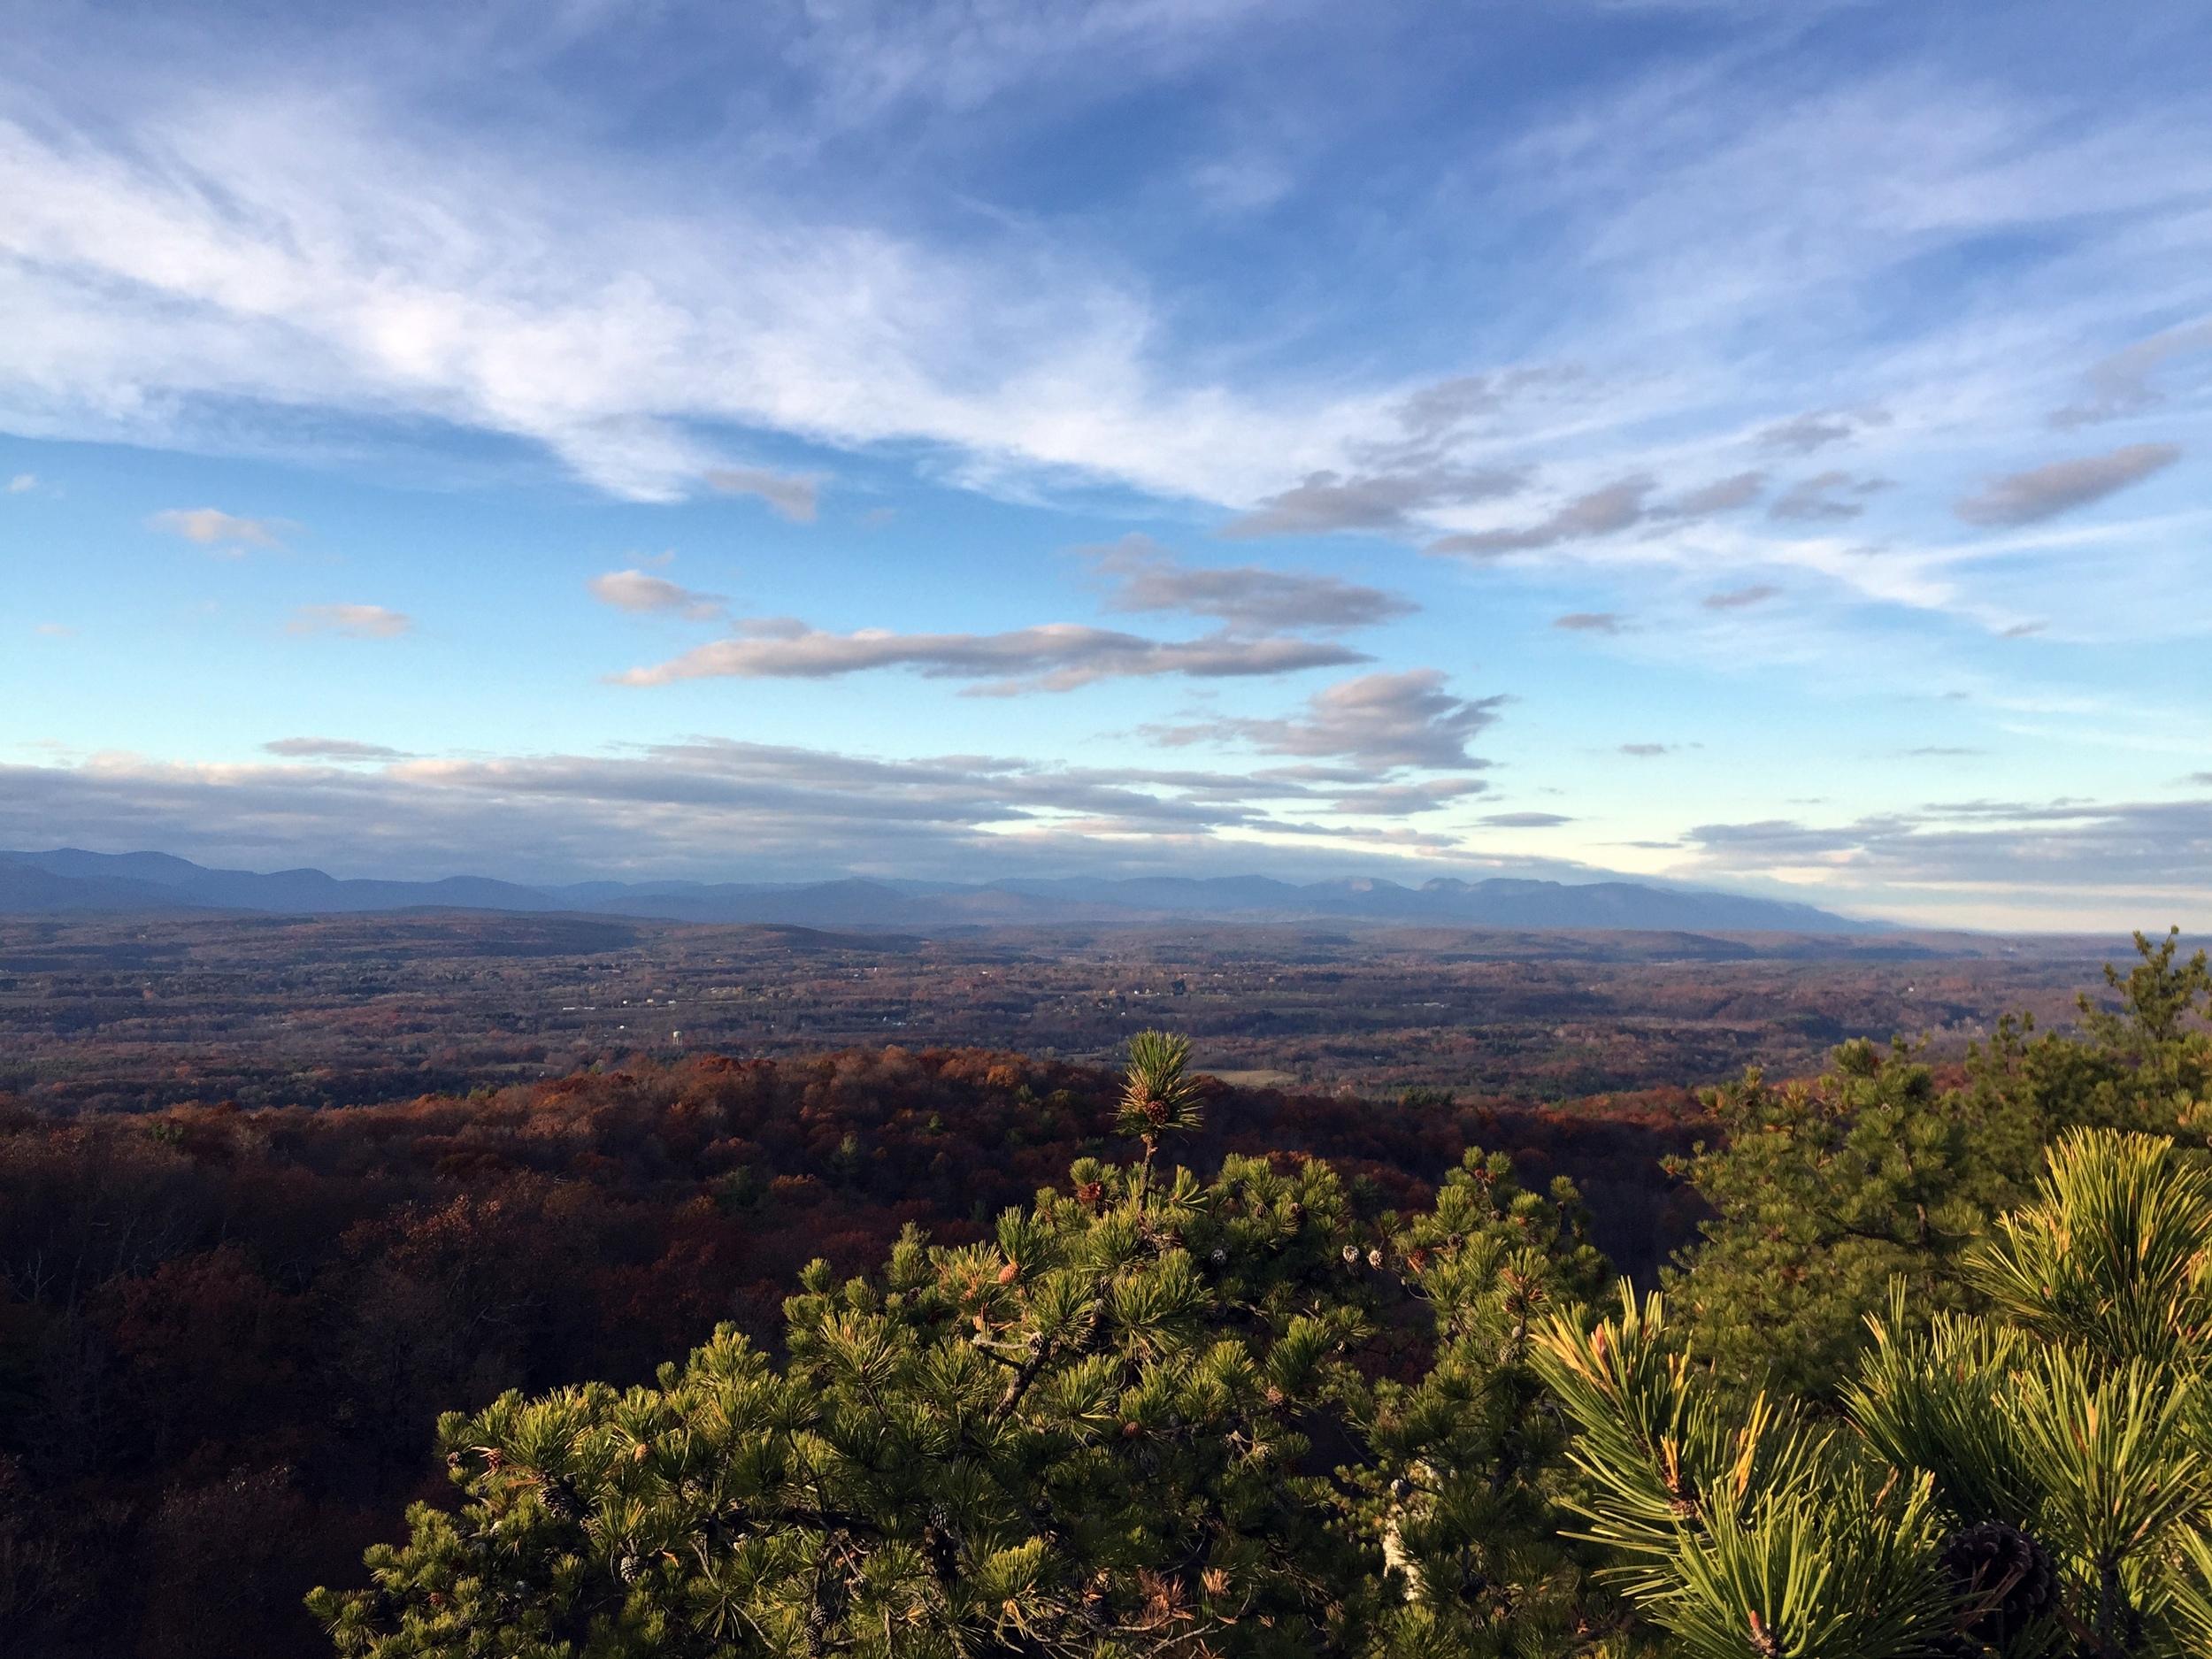 Catskills-view-shawangunk-ridge-mohonk-minnewaska-new-paltz-kerhonkson-high-falls-hike-ny.JPG